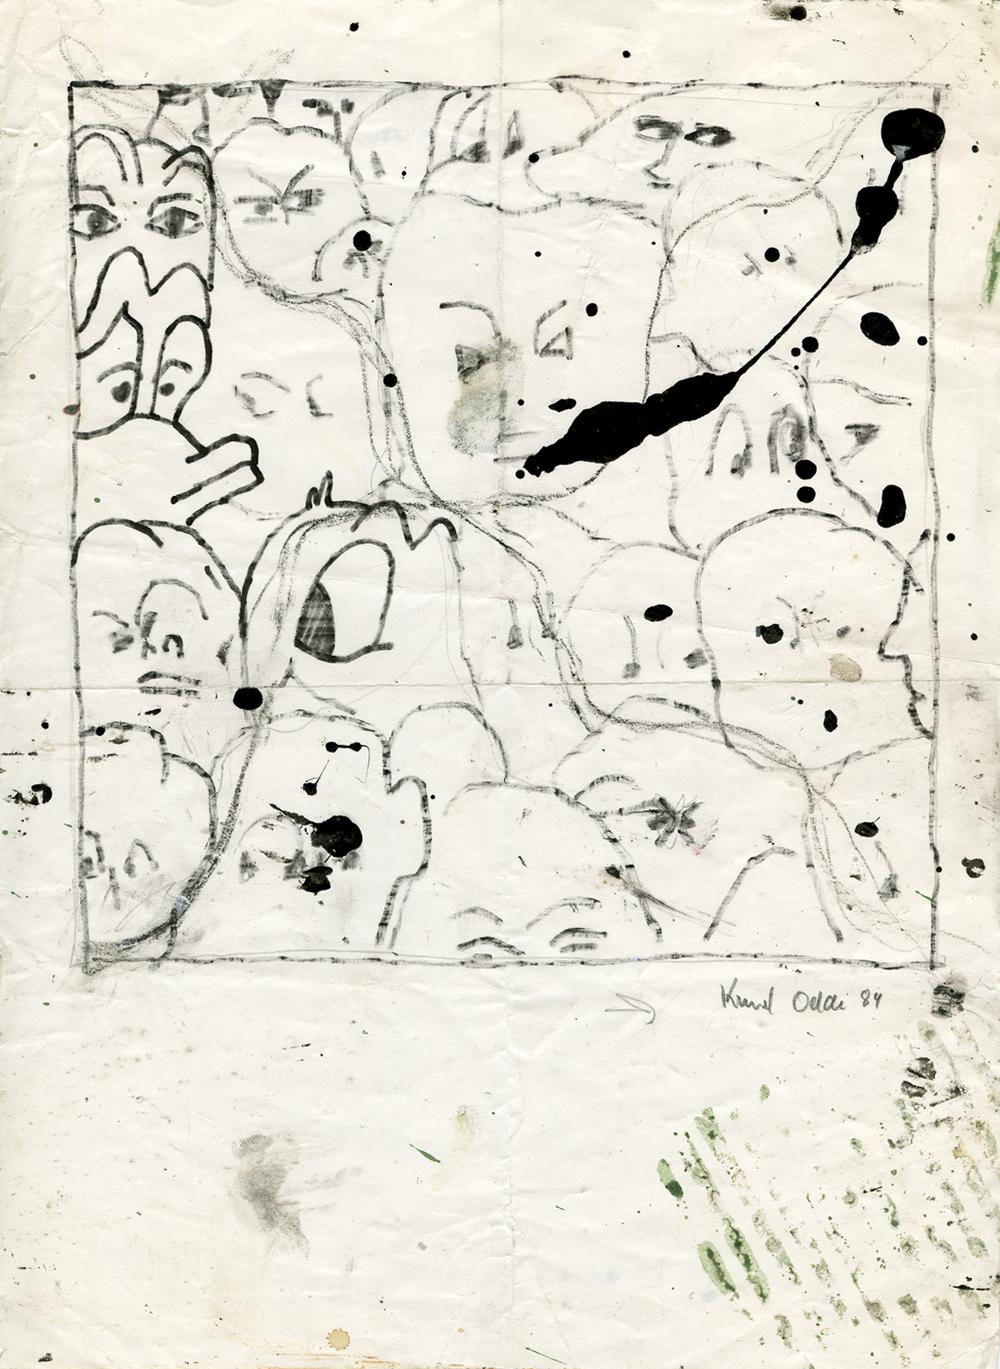 Paper_Donald D._29,5x21cm_Ink, permanent marker_1984